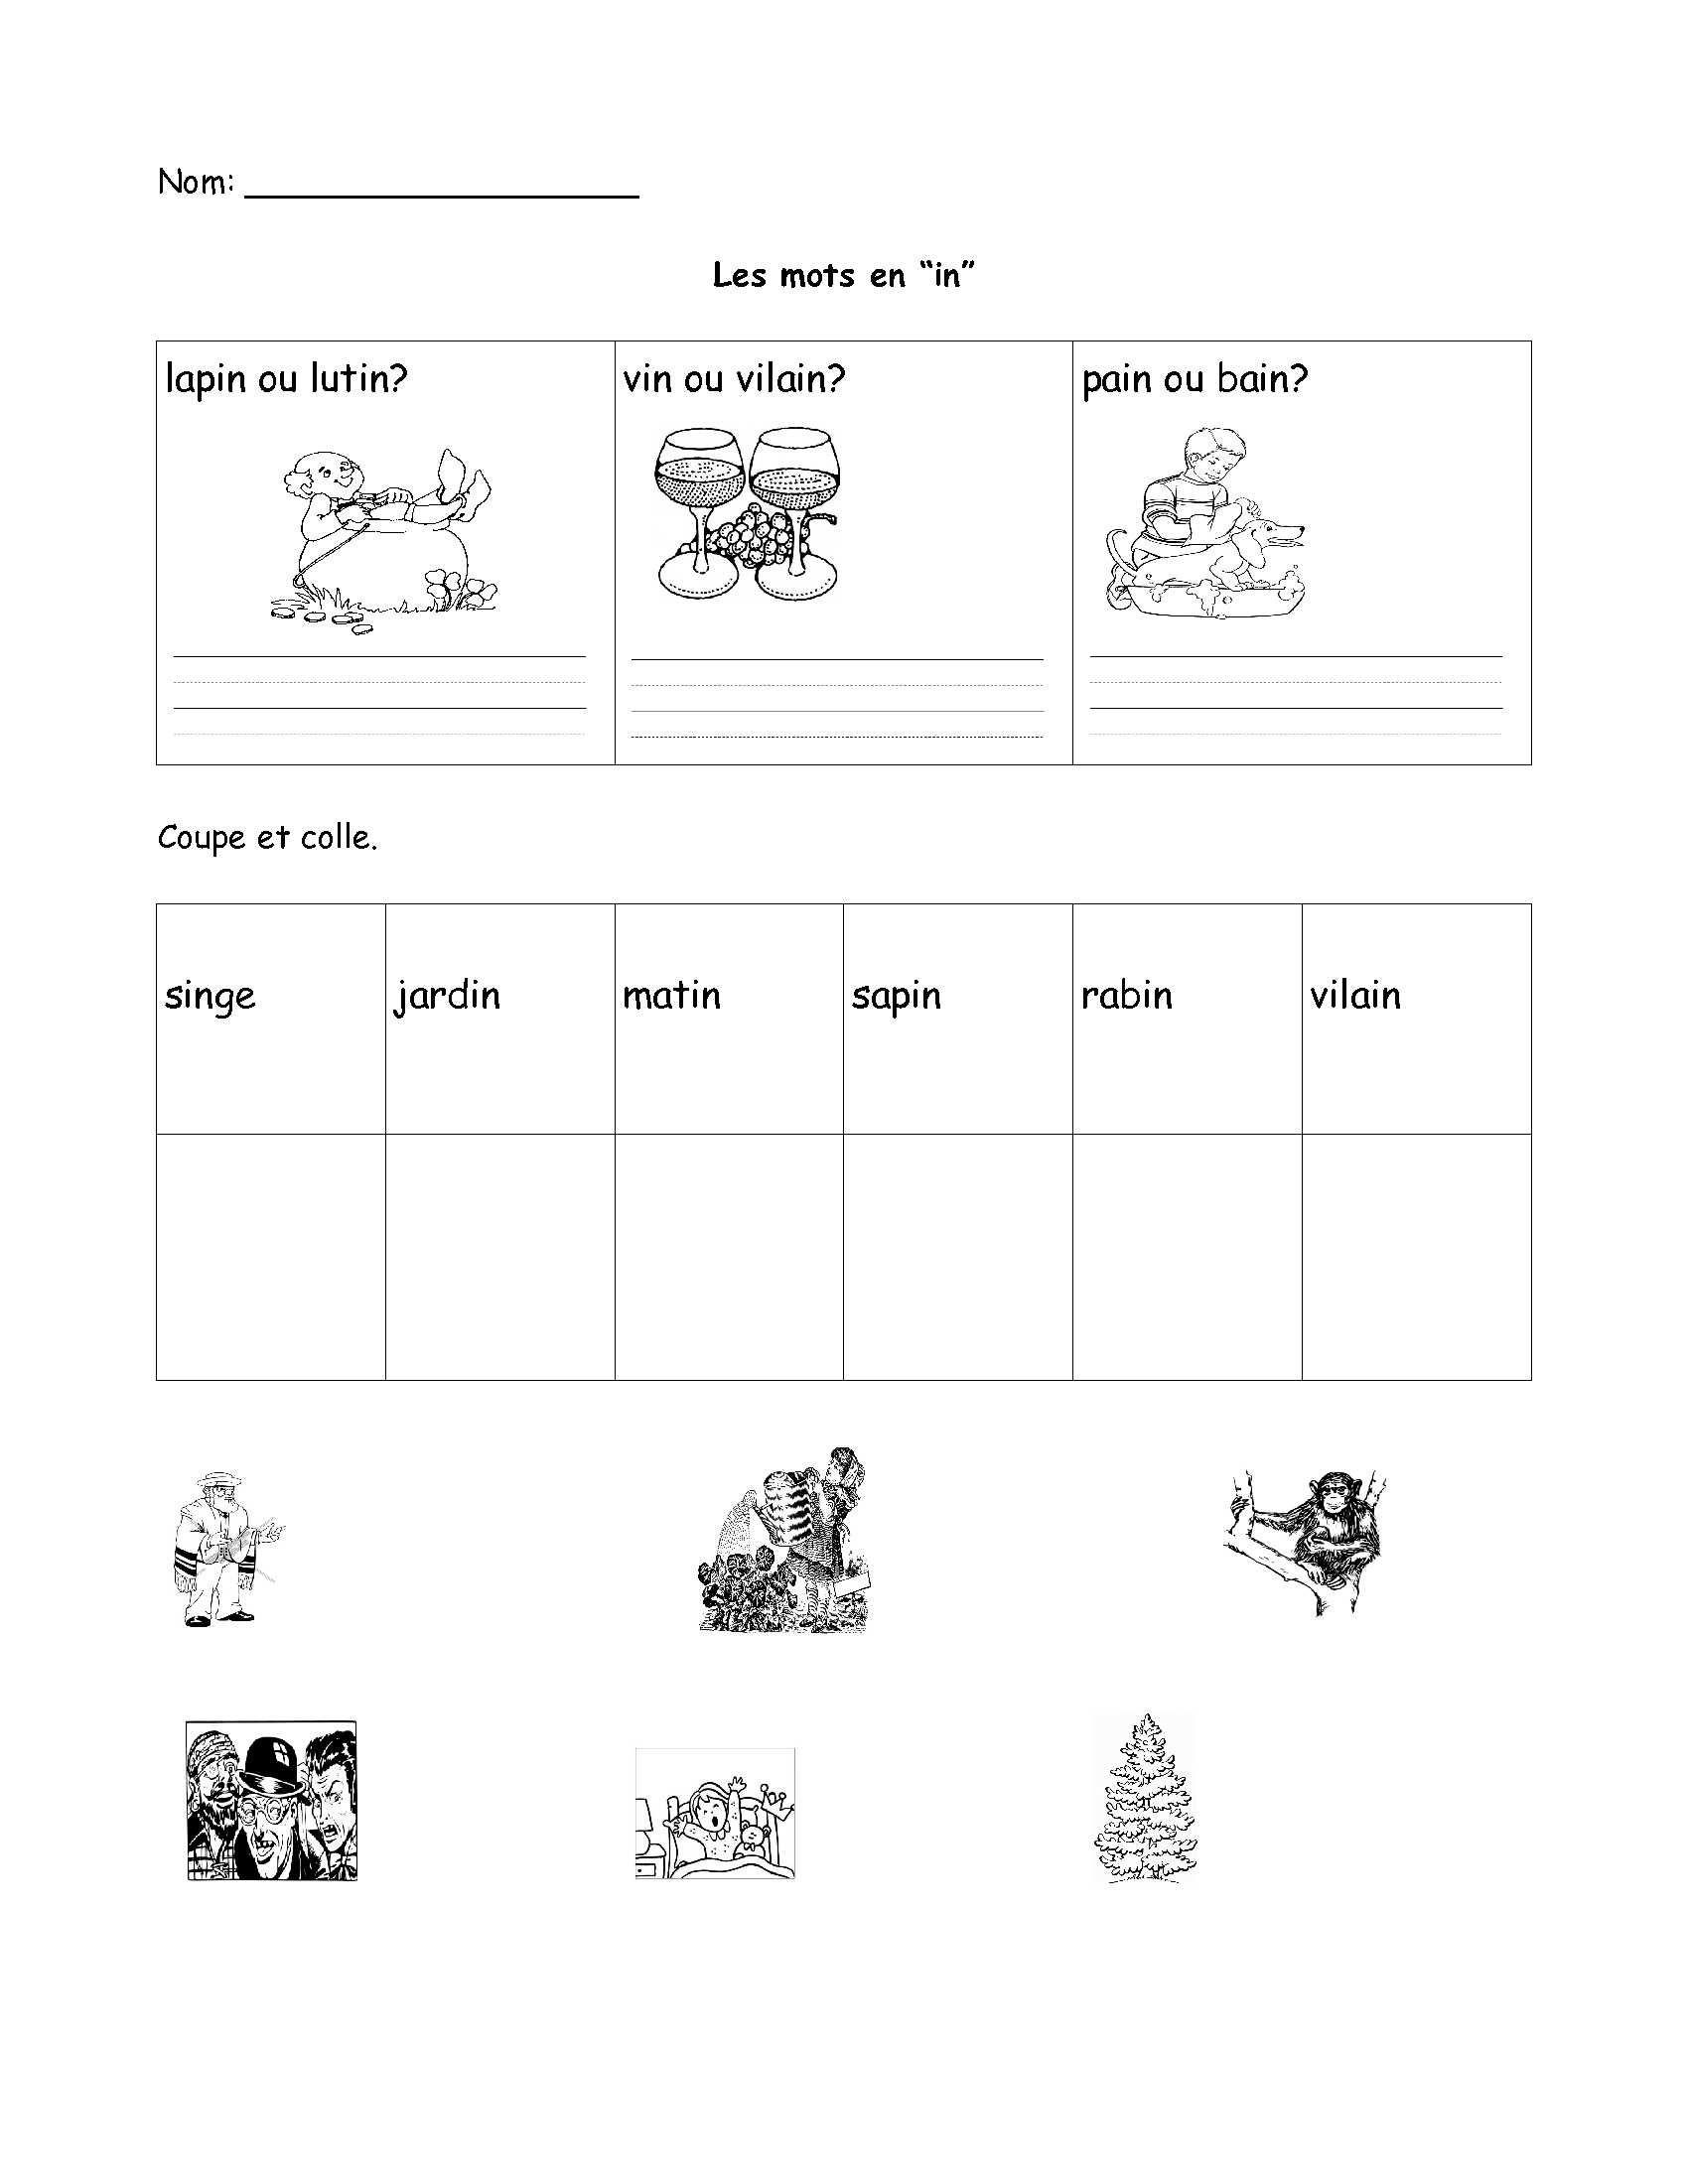 Free French Worksheet- Grade 1, Grade 2, Grade 3. Fsl, Core French | Free Printable French Worksheets For Grade 1